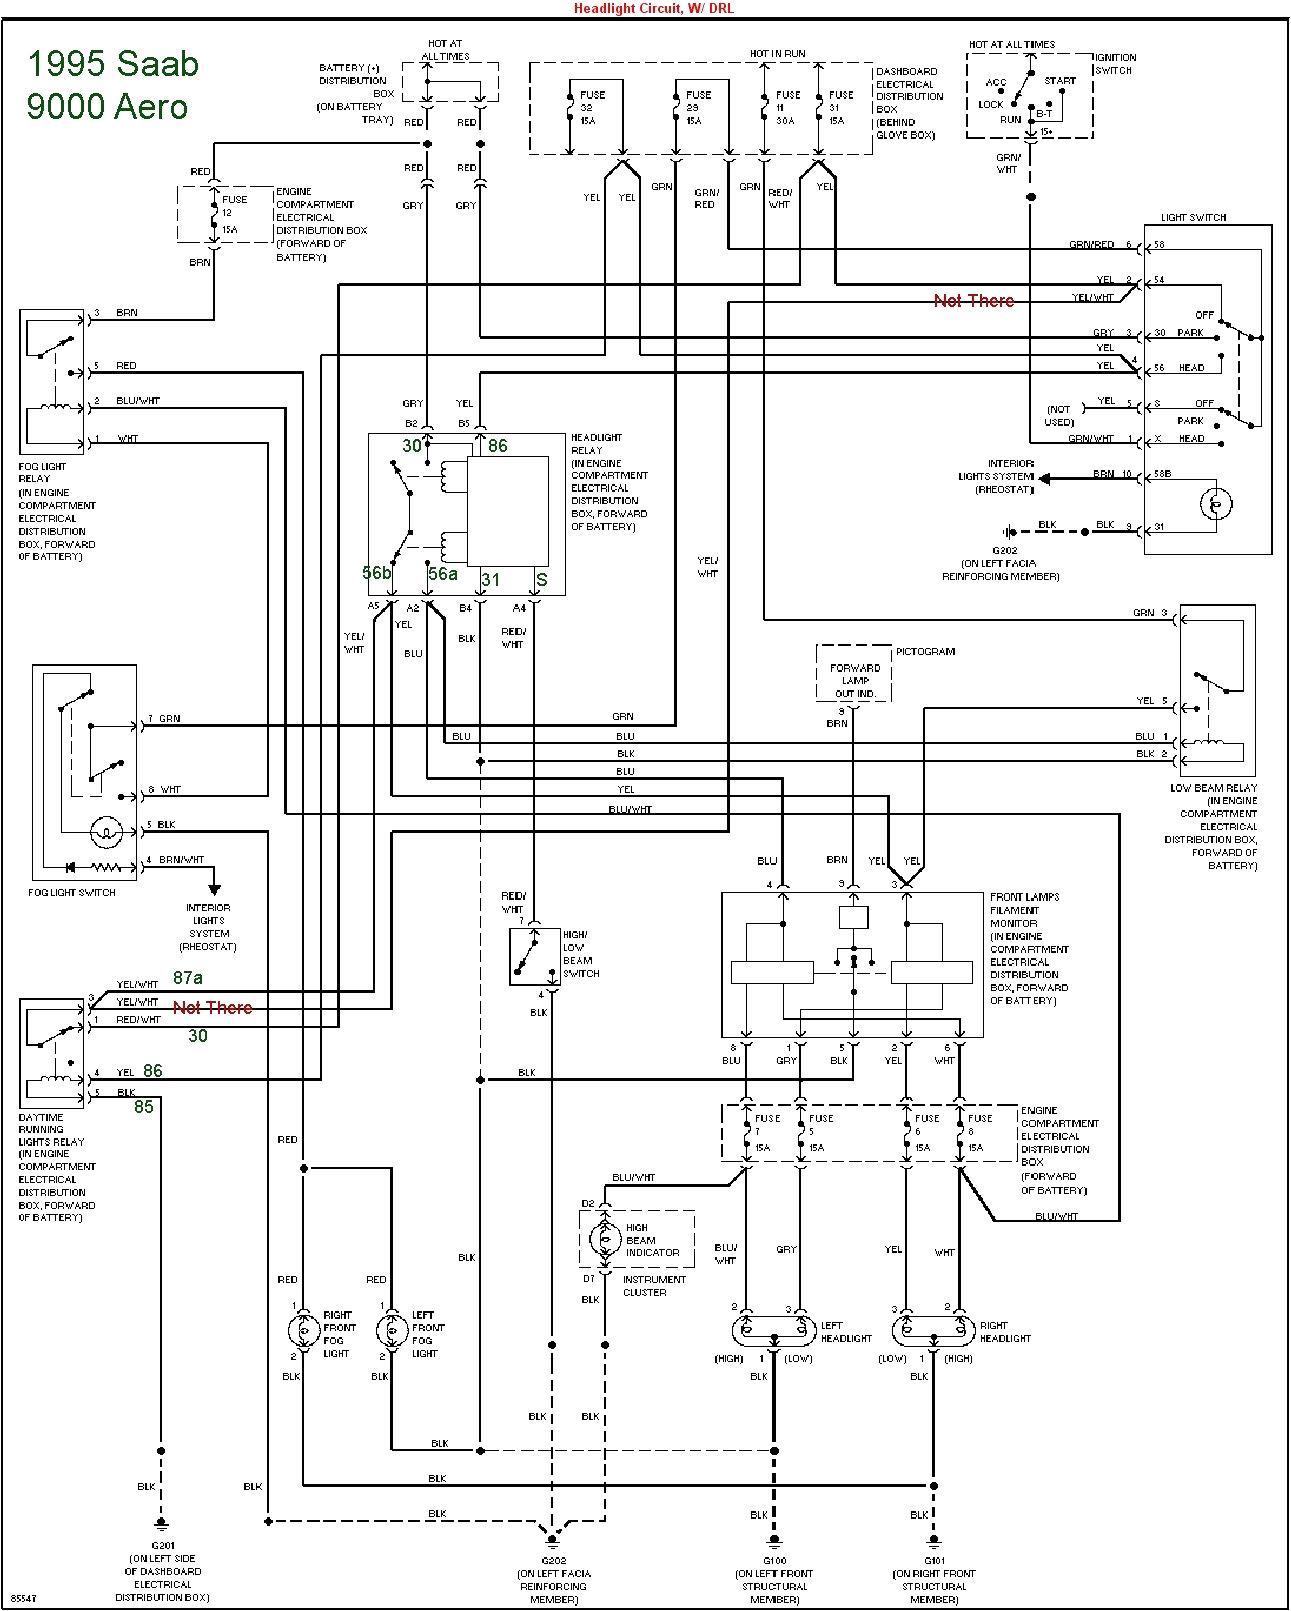 1992 saab 900 wiring harness wiring diagram details saab 900 wiring harness